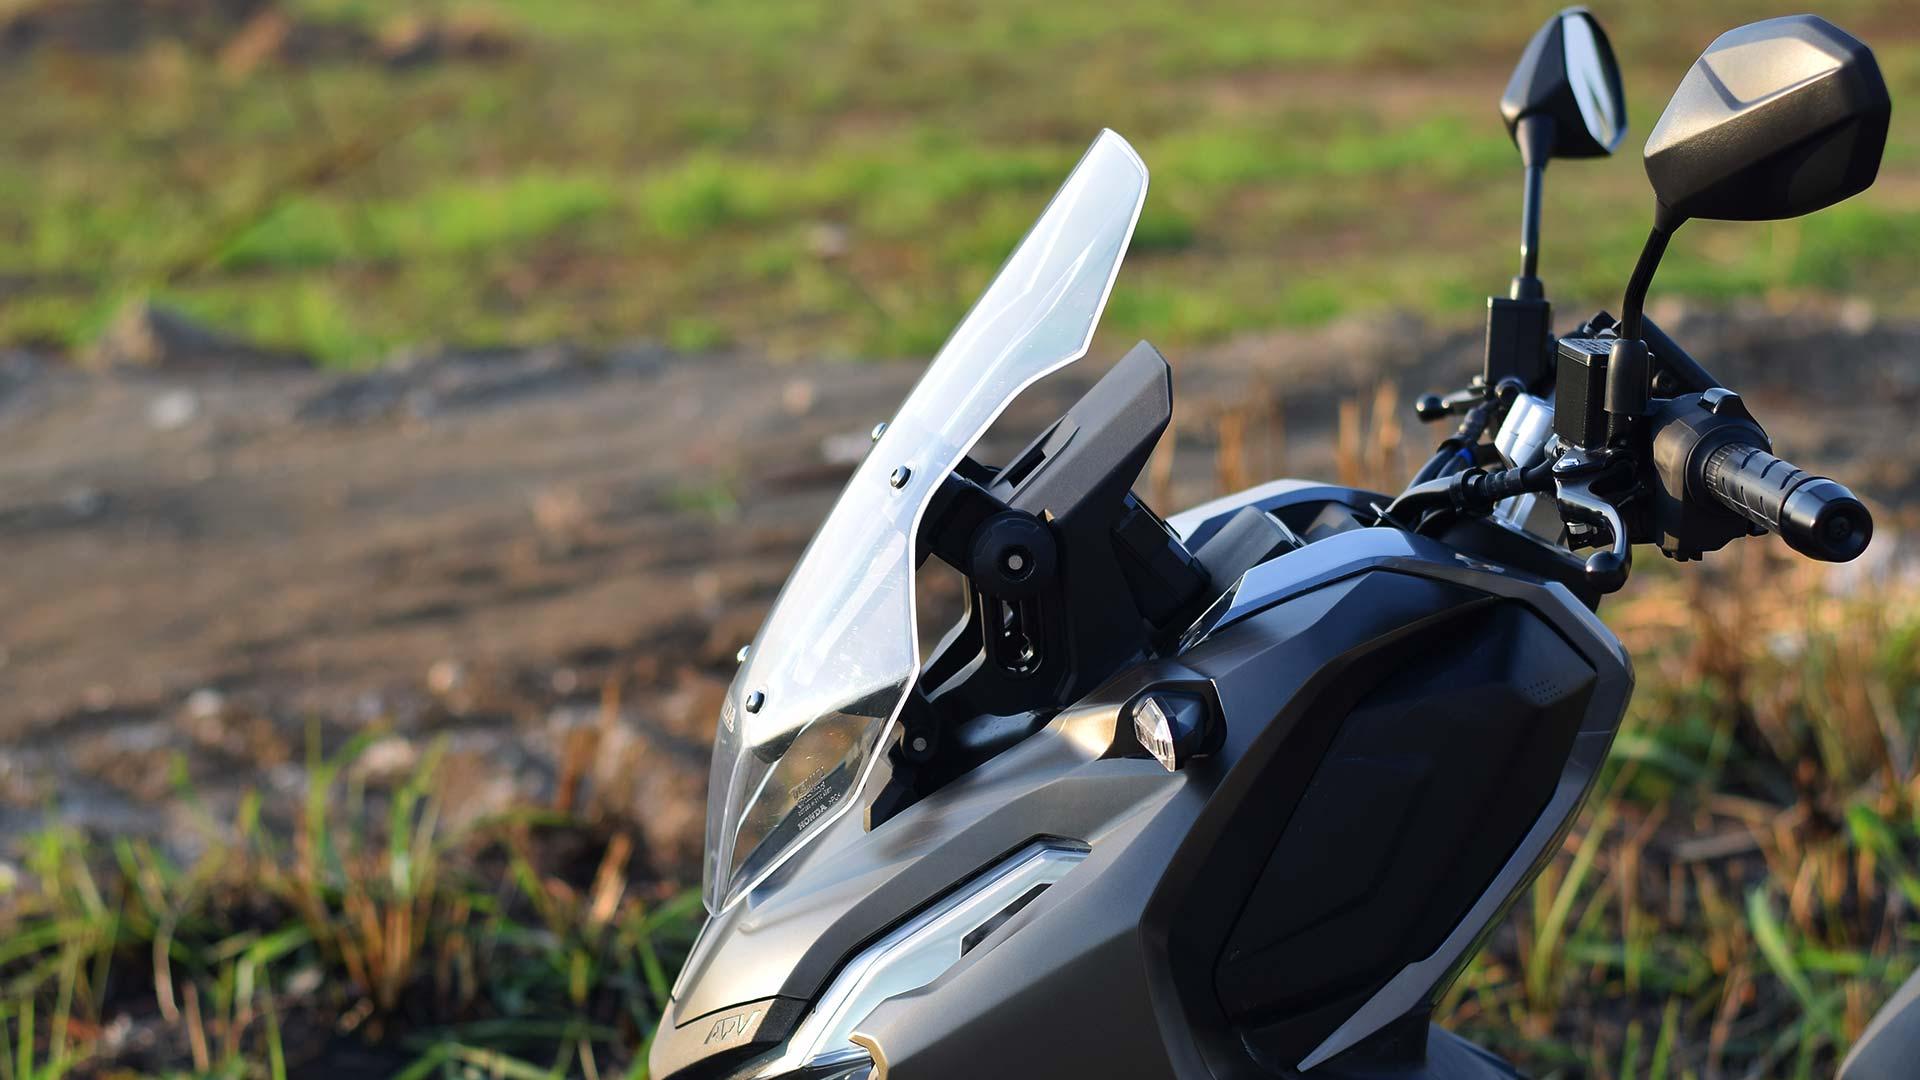 Honda ADV 150 Windshield